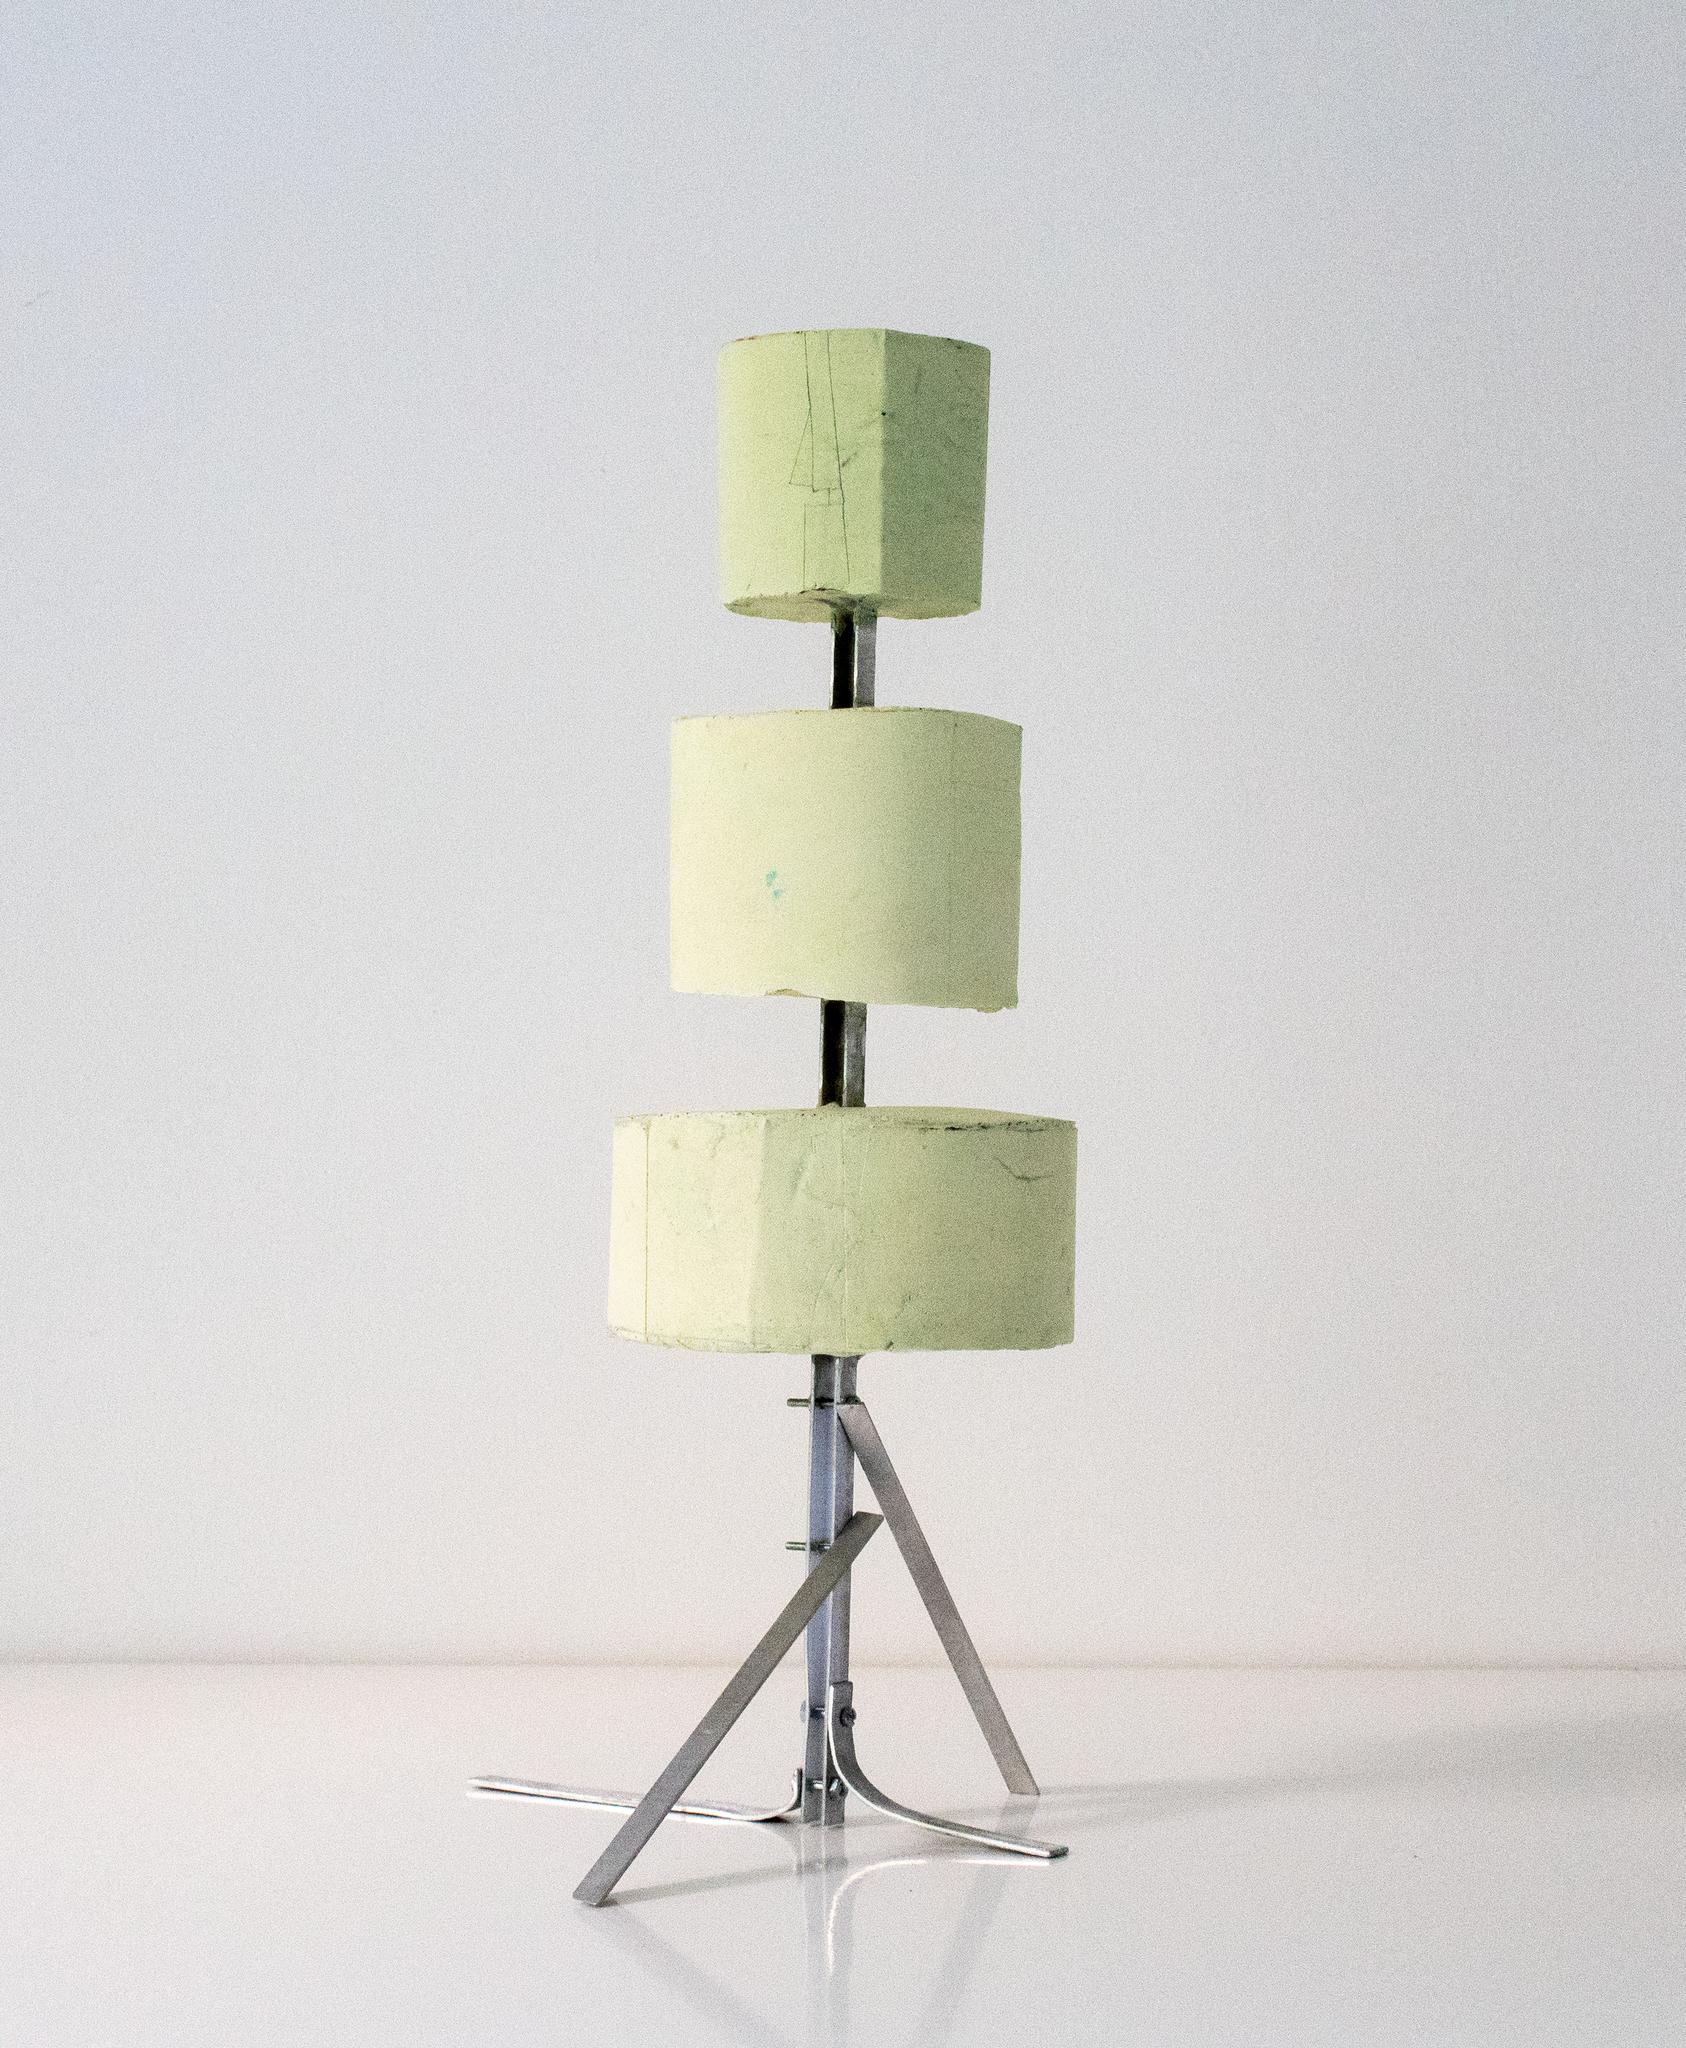 Formschnitt Nr.3_Betonguss, Pigment; Aluminium_33 x 17 x 15,5 cm_2018